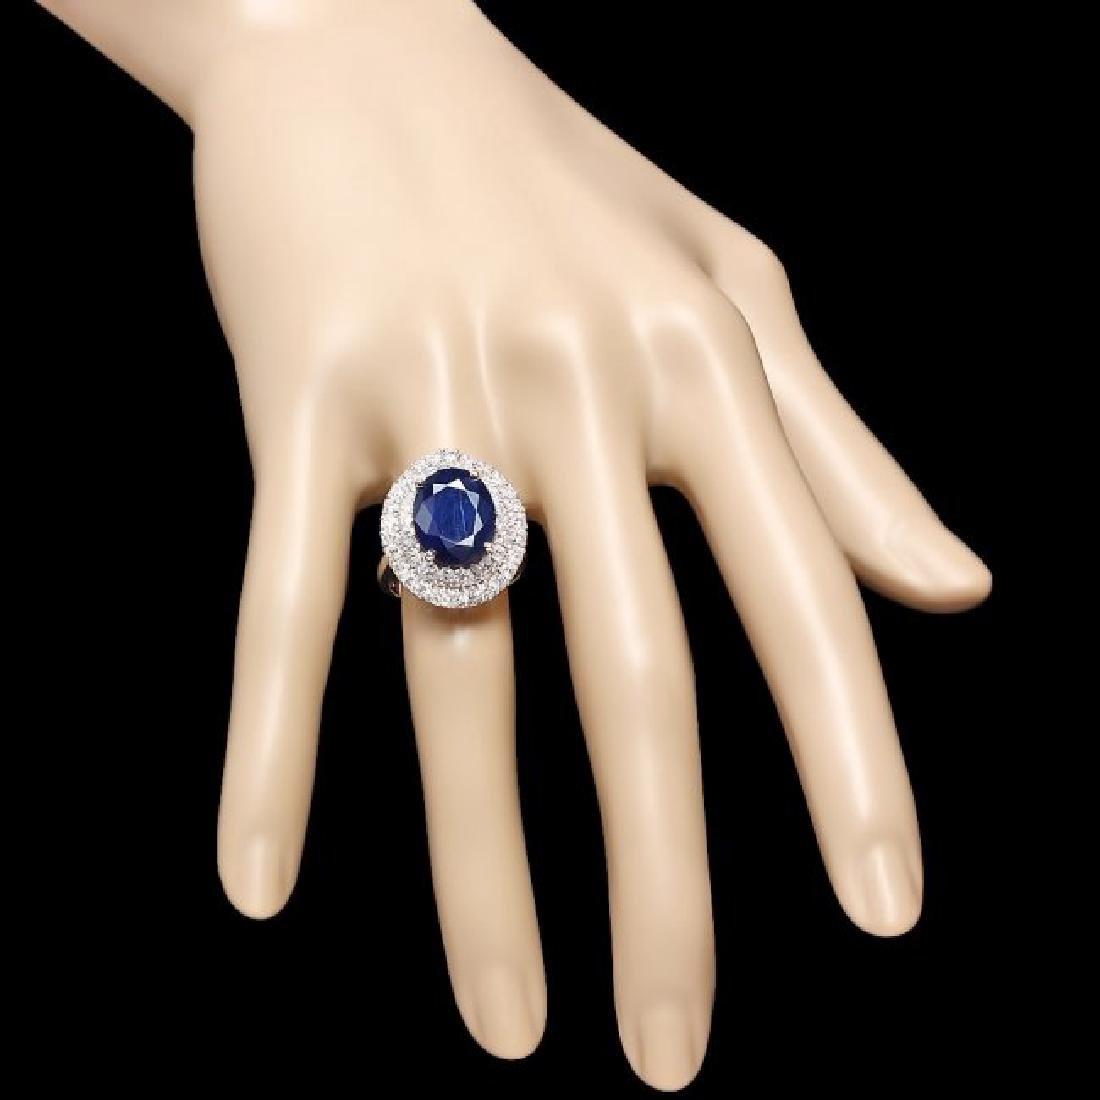 14k Gold 8.00ct Sapphire 1.65ct Diamond Ring - 4